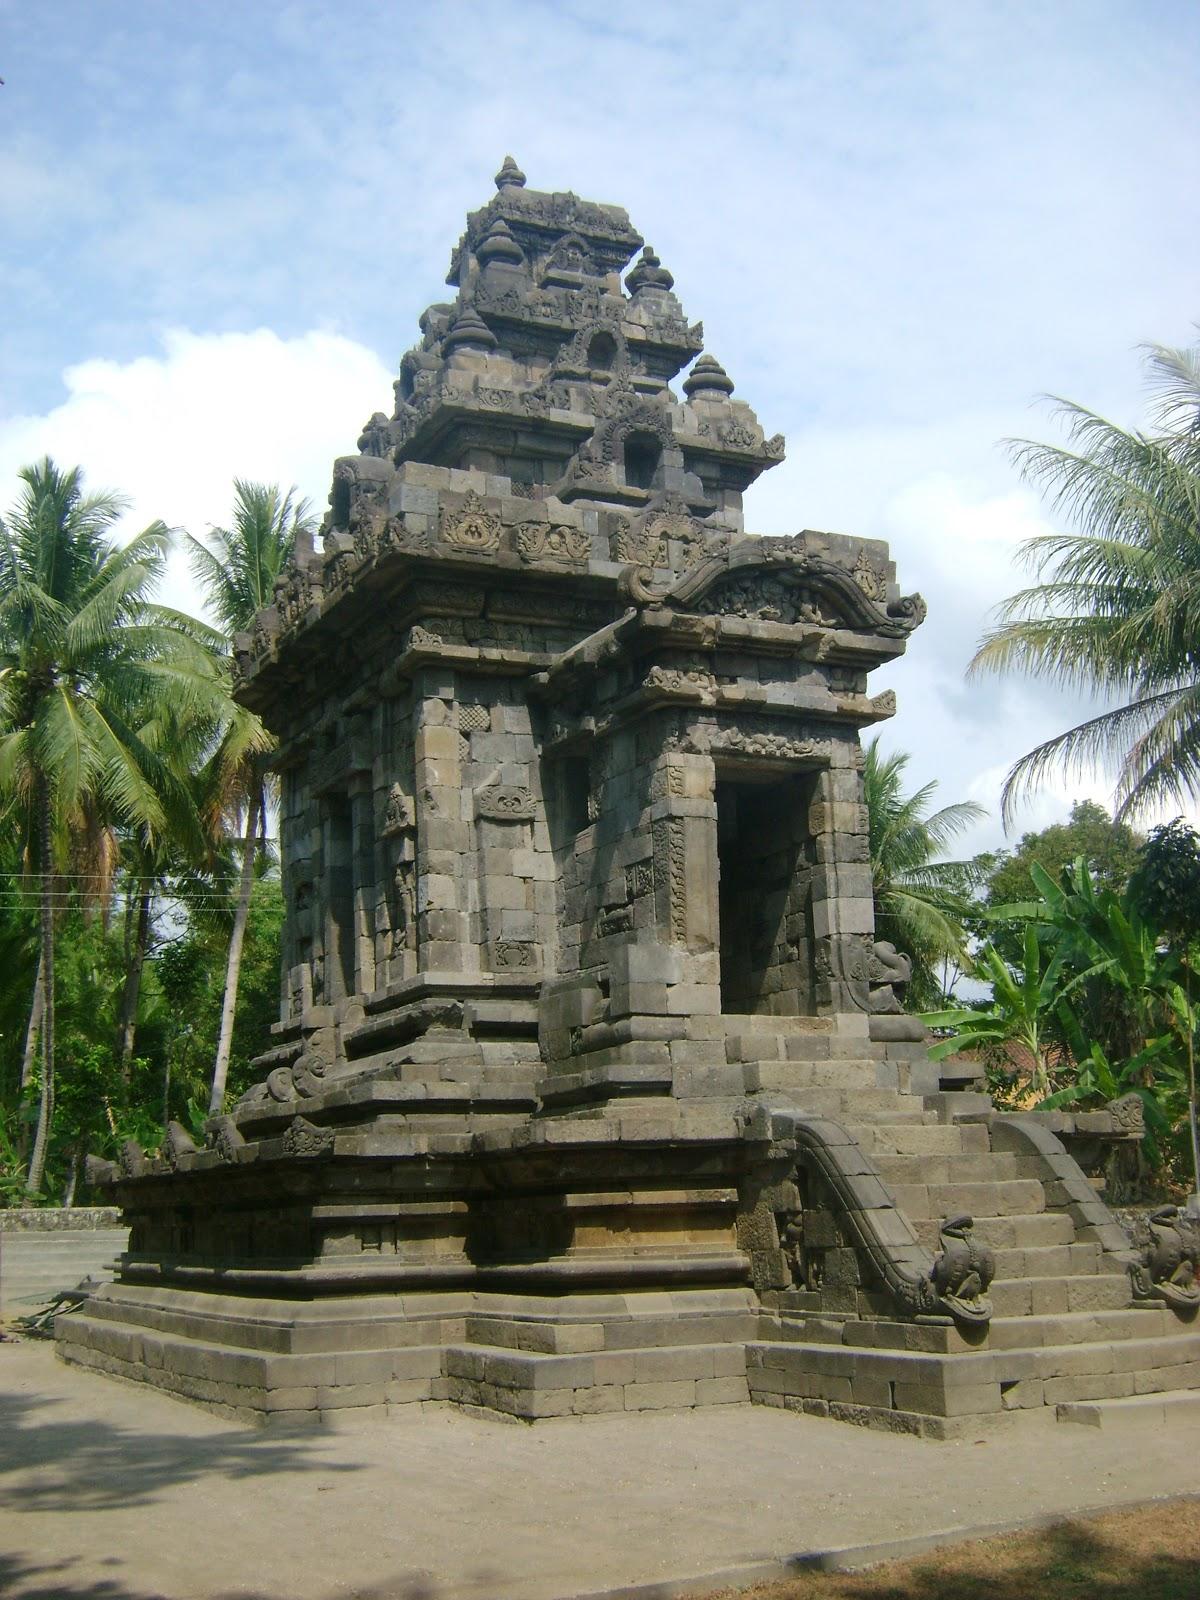 Candi Peninggalan Budha : candi, peninggalan, budha, Gambar, Peninggalan, Hindu, Budha, Indonesia, Social, Sciences, Candi, Kerajaan, Rebanas